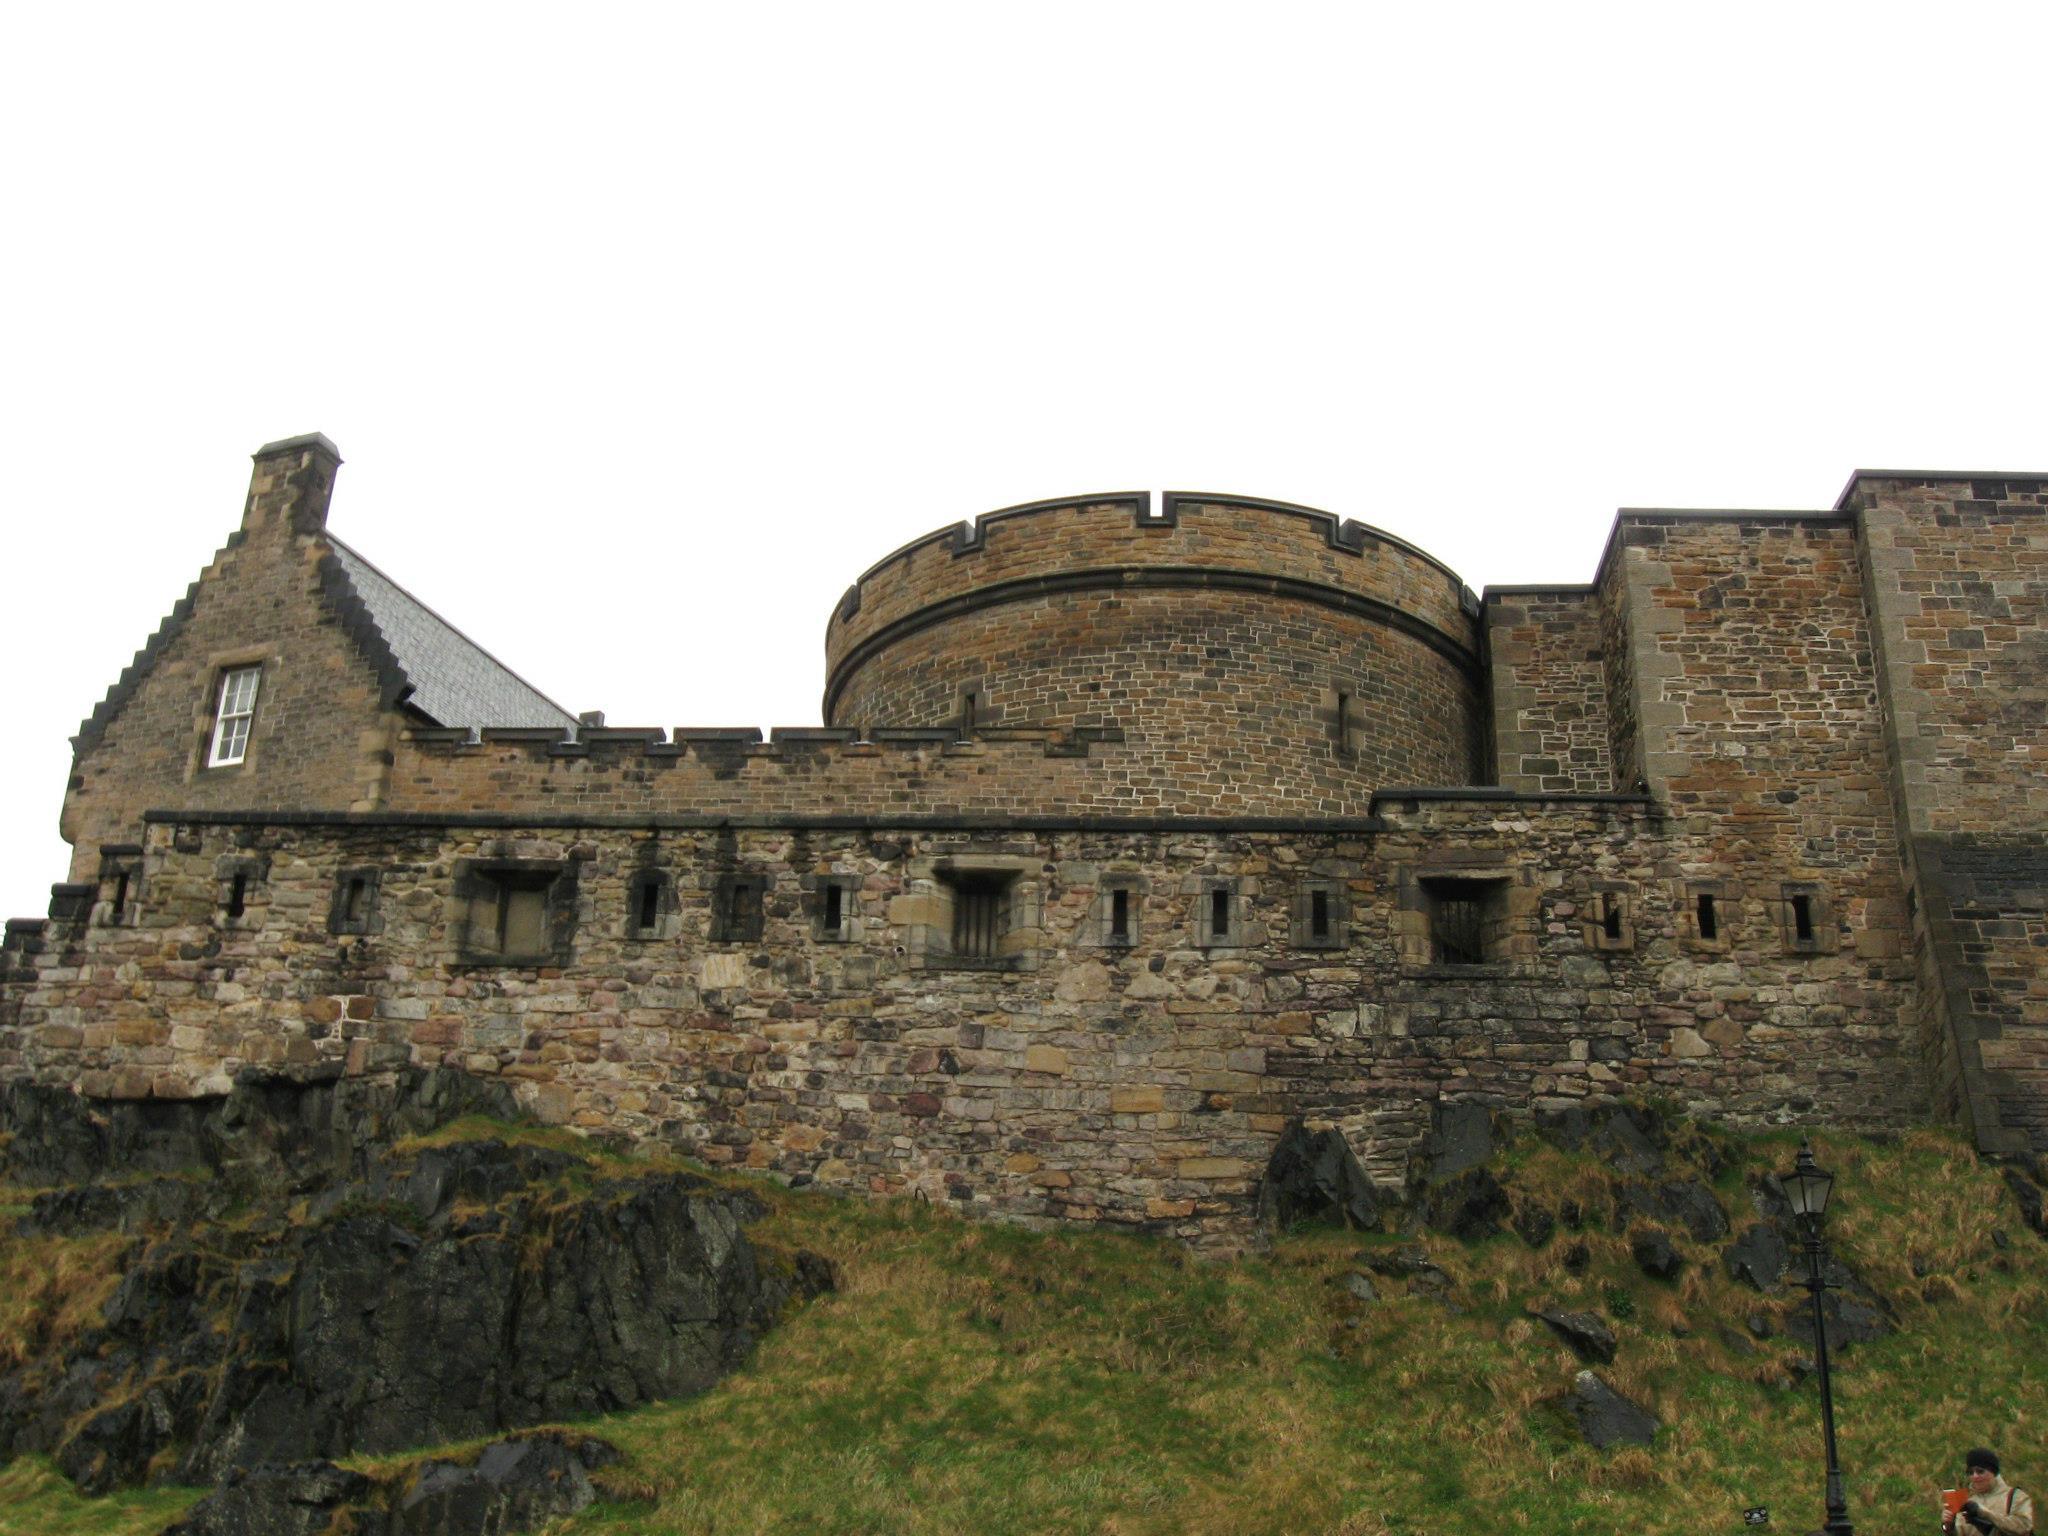 Edinburgh castlerock solid symbol of gratitude biocorpaavc Gallery